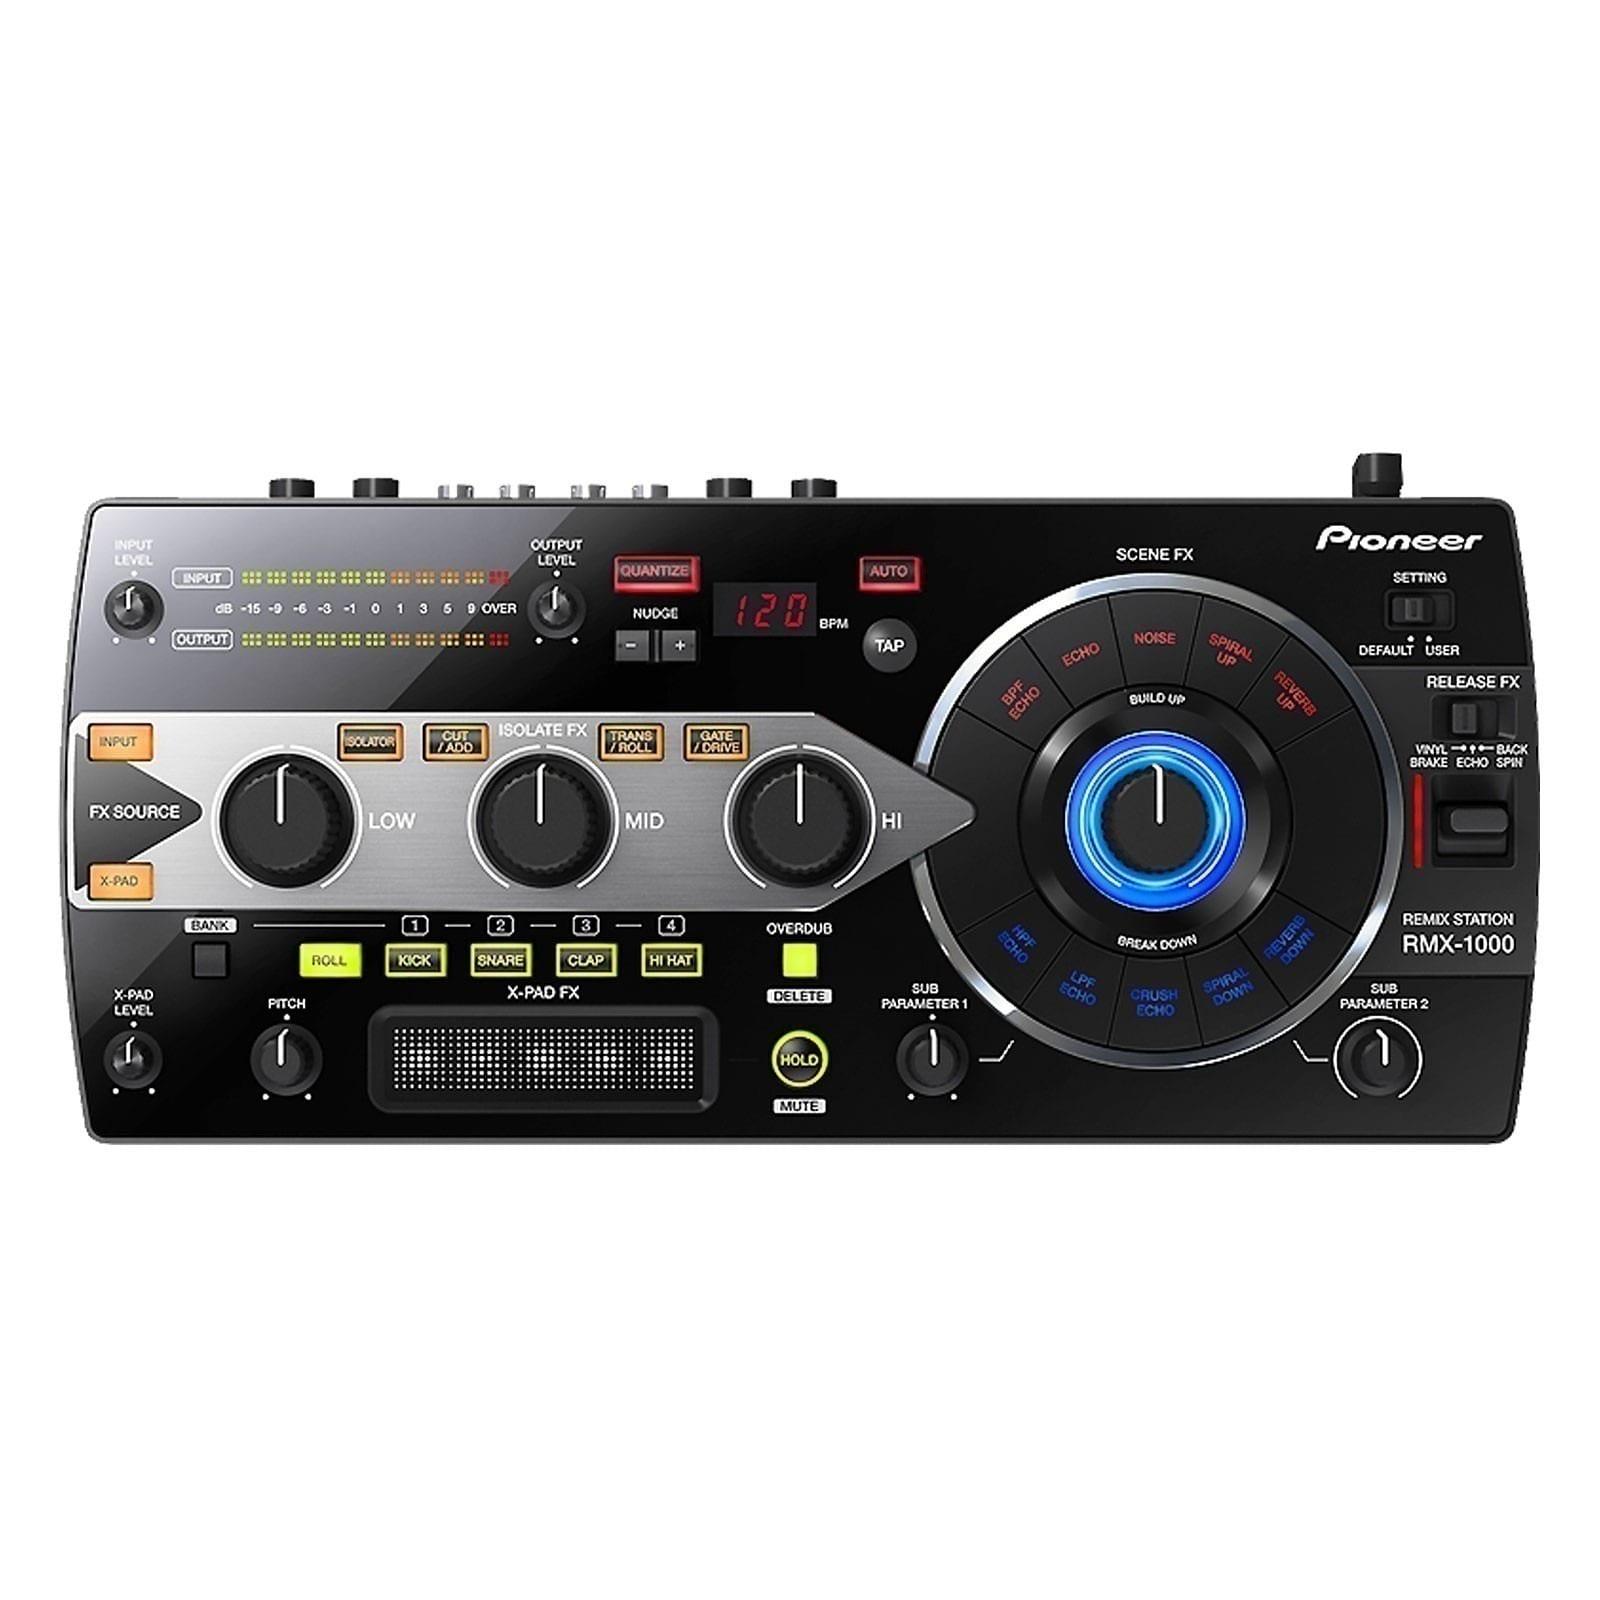 pioneer-rmx-1000-remix-station-e83.jpg